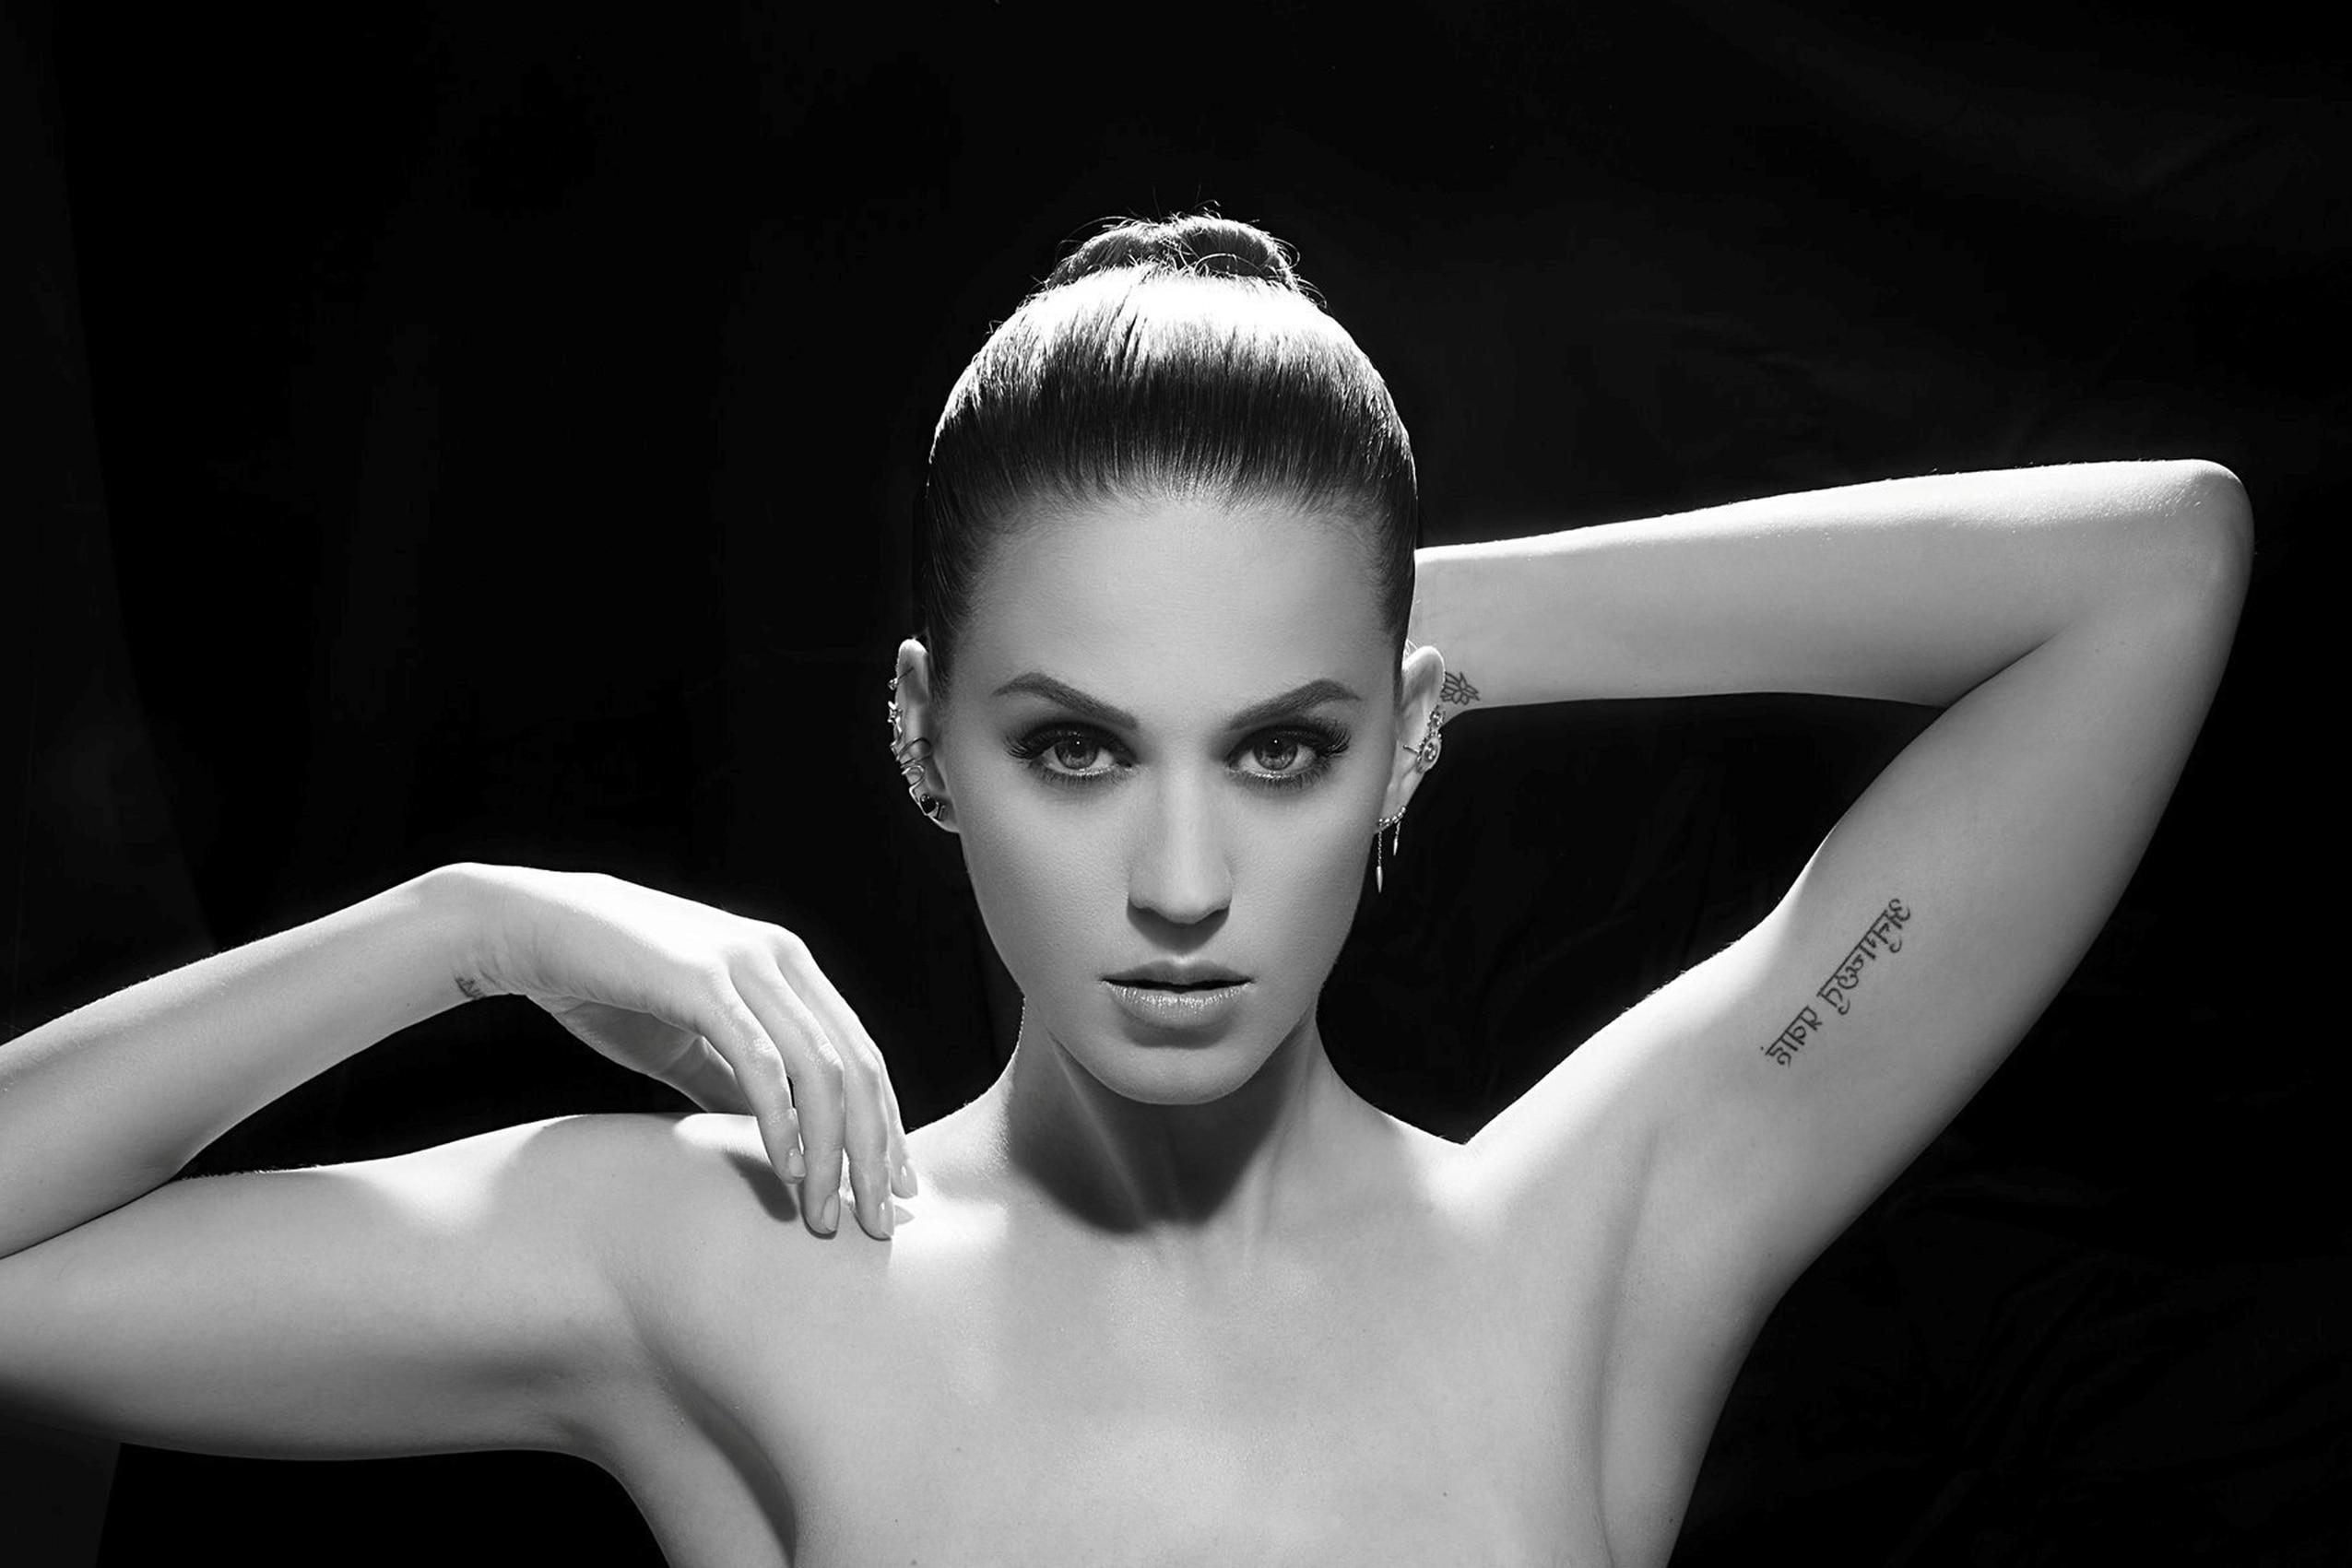 Katy Perry retrato blanco y negro tatuajes KC863 Sala hogar pared ...